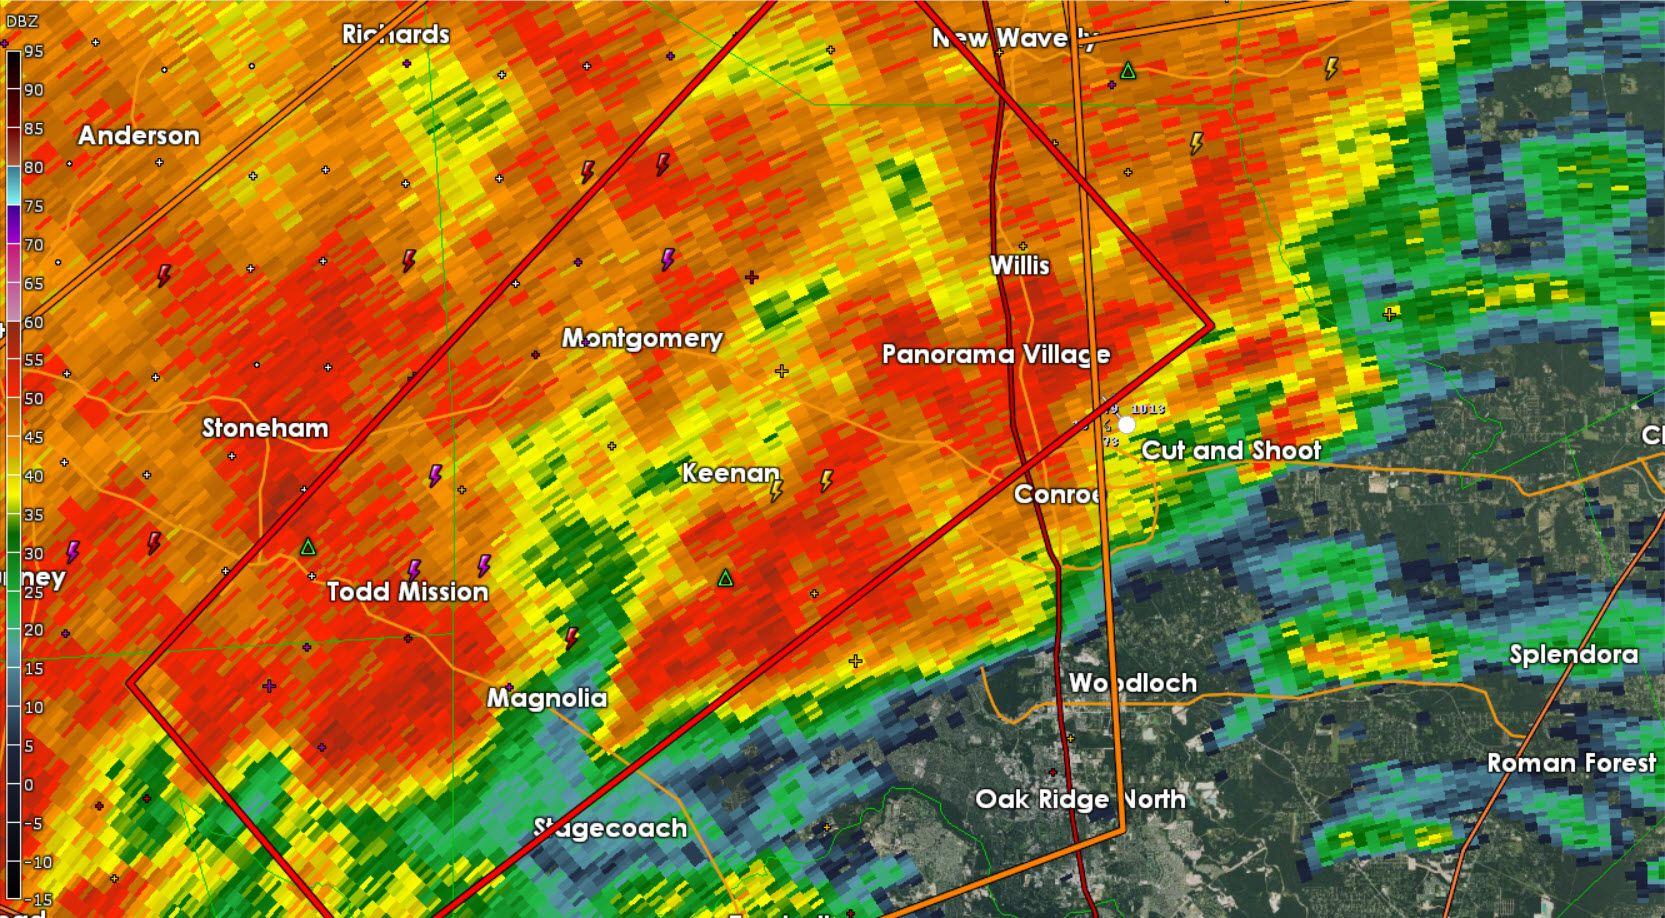 Tornado Warning Harris Walker Waller Montgomery Grimes Counties Till 815pm Texas Storm Grimes County Tornado Warning